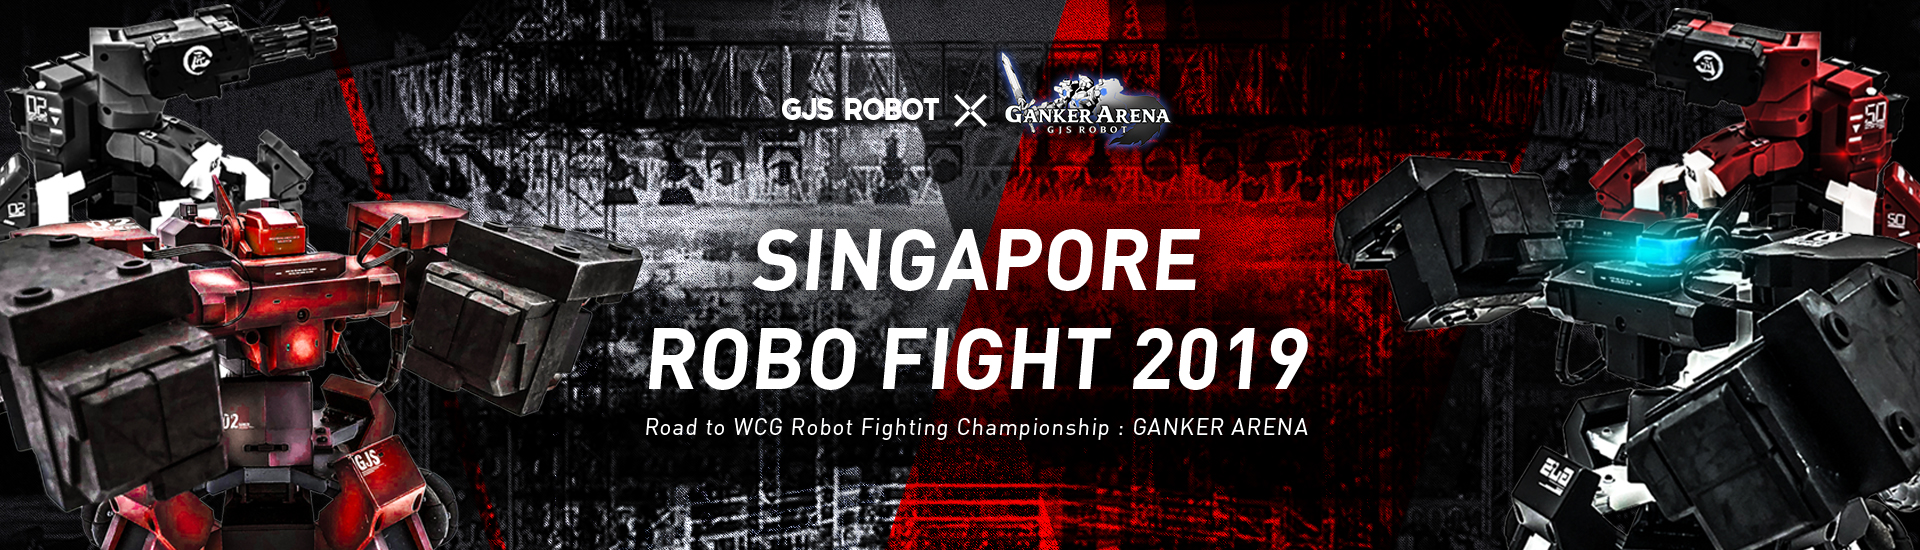 cee 2019 - gamex robofight